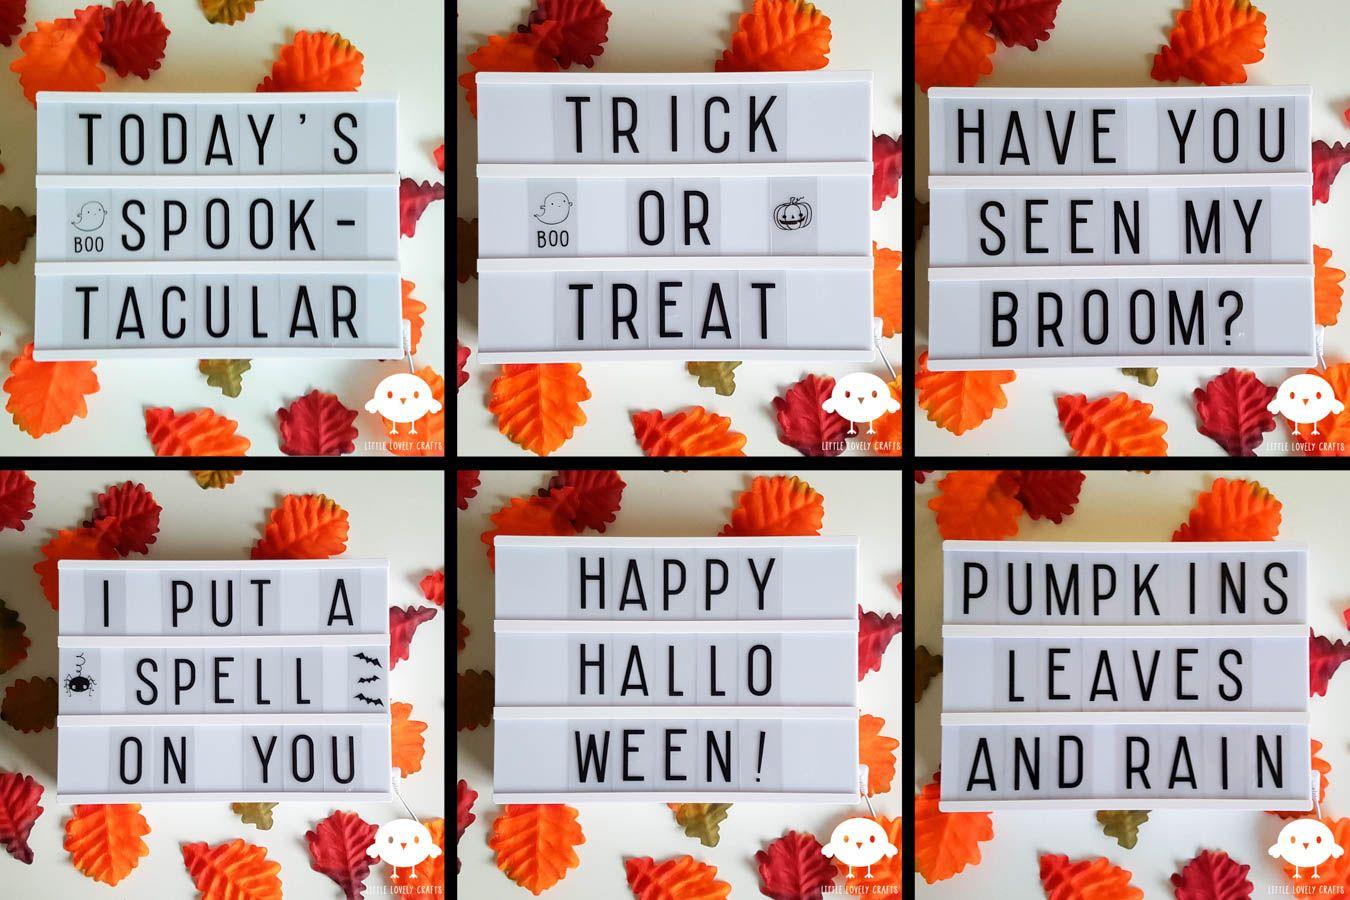 Lightbox Ideas For Halloween Light Box Quotes Cinema Light Box Quotes Light Box Sign